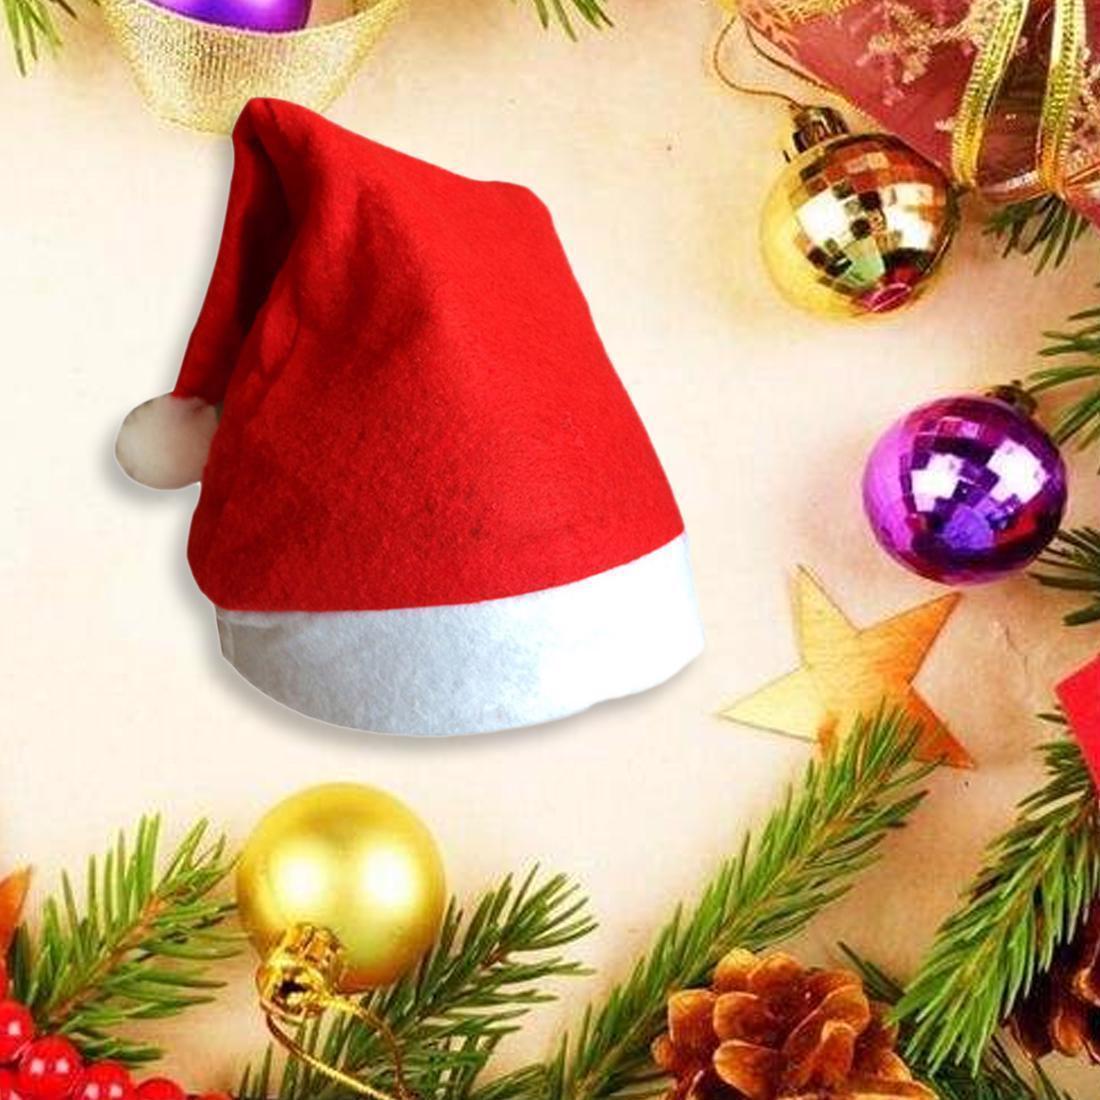 Kids Christmas Santa Hat Xmas Led Snowman Cap Reindeer Red Plush Costume Gifts